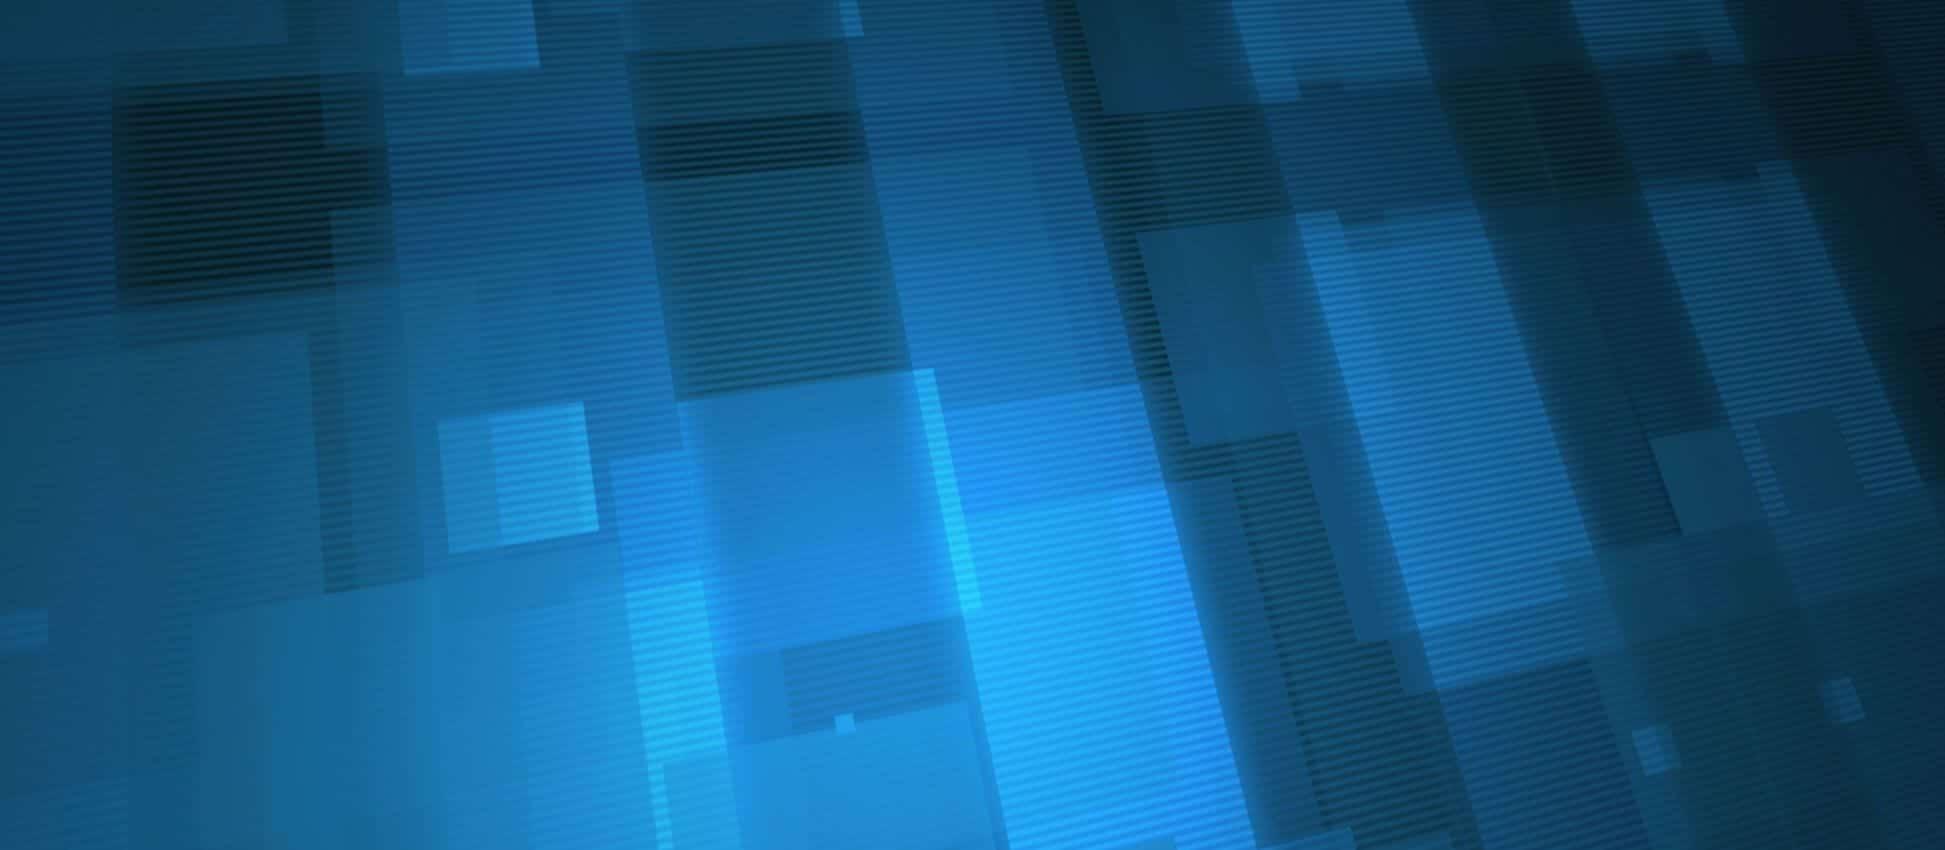 Web Design in Charleston - Internet Marketing Agency in Charleston